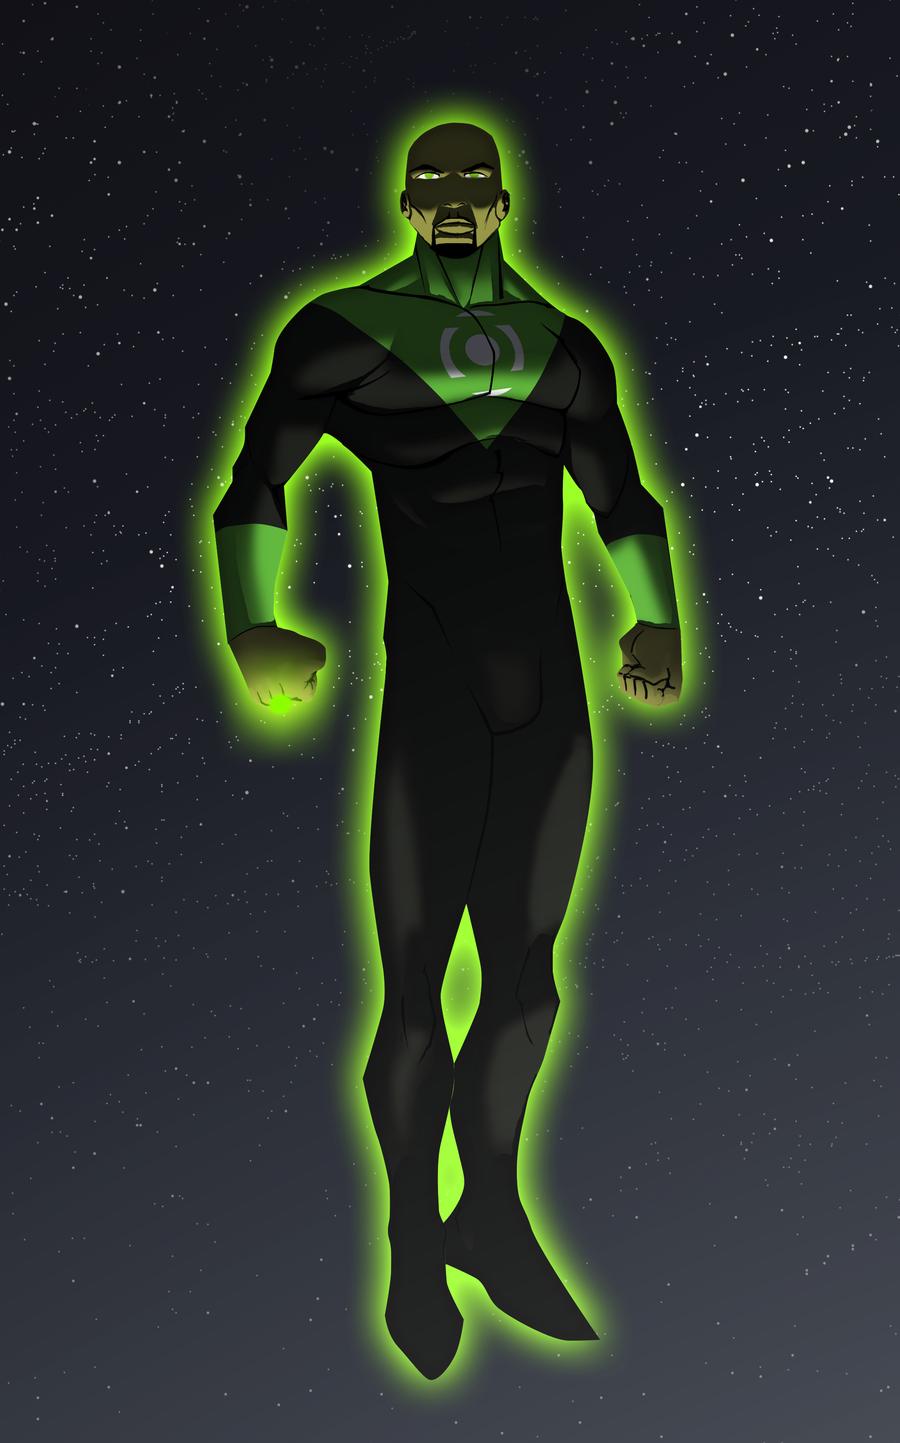 Green_Lantern__John_Stewart_by_xJoeDx